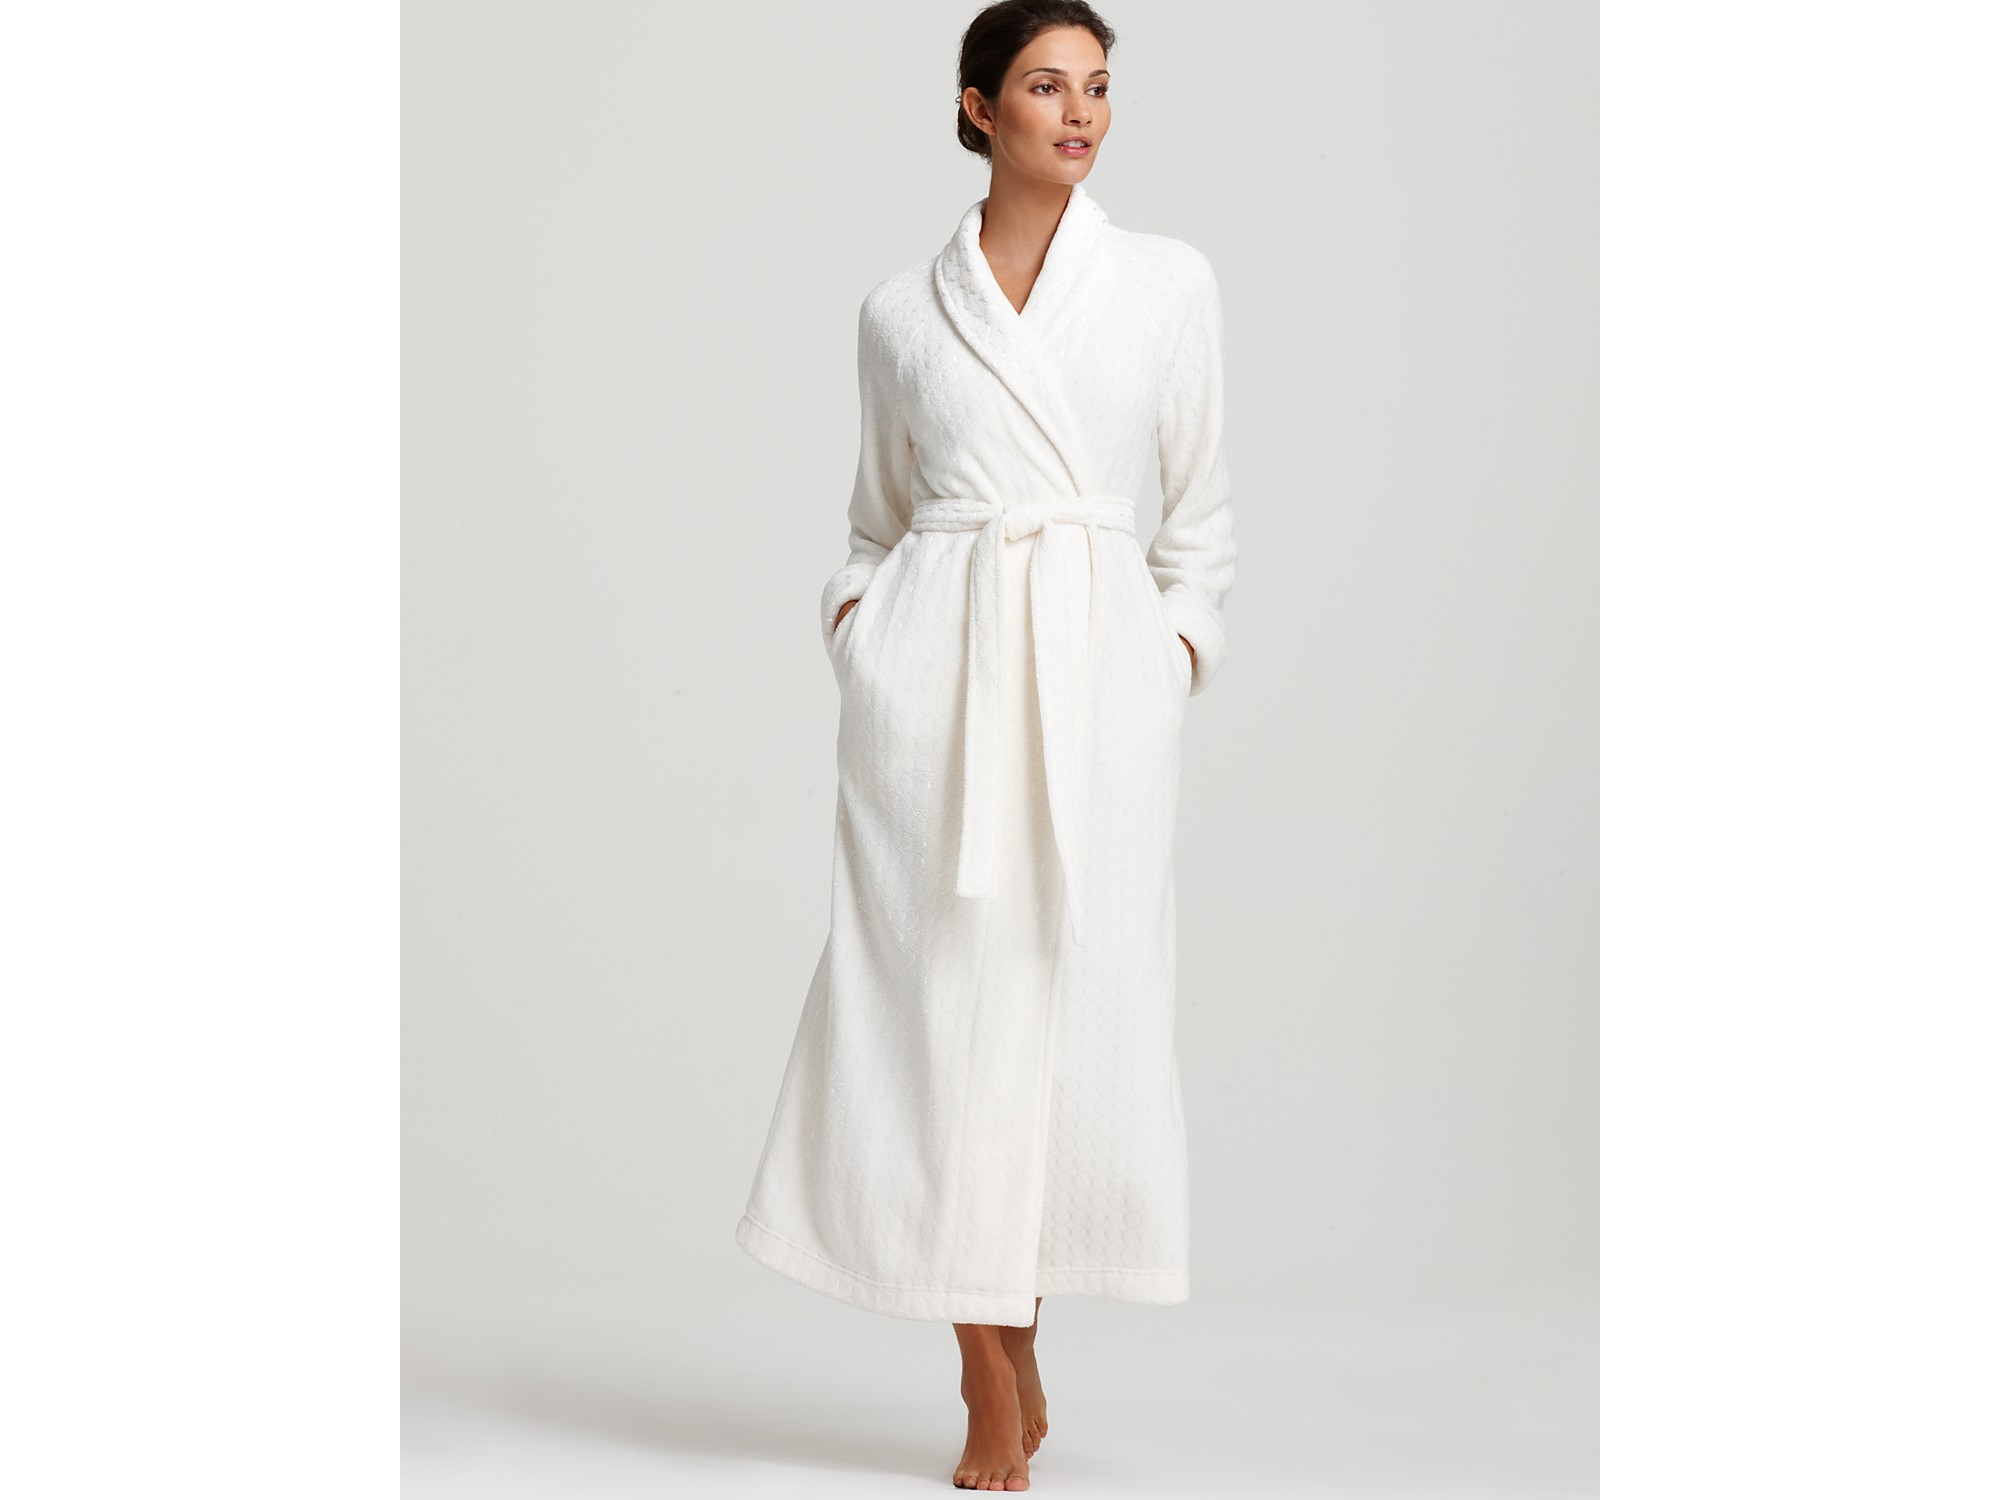 04172ce40f Lyst - Oscar de la Renta Pink Label Cozy Comfort Plush Long Robe in ...